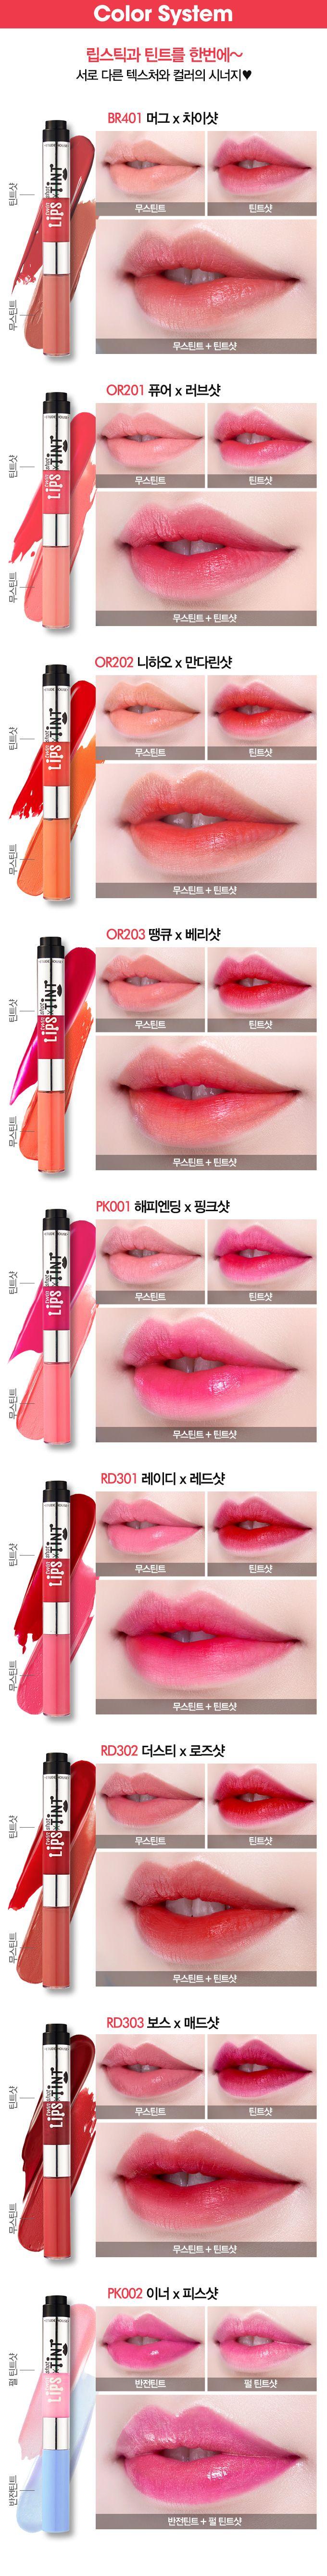 Etude House Twin Shot Lips Tint